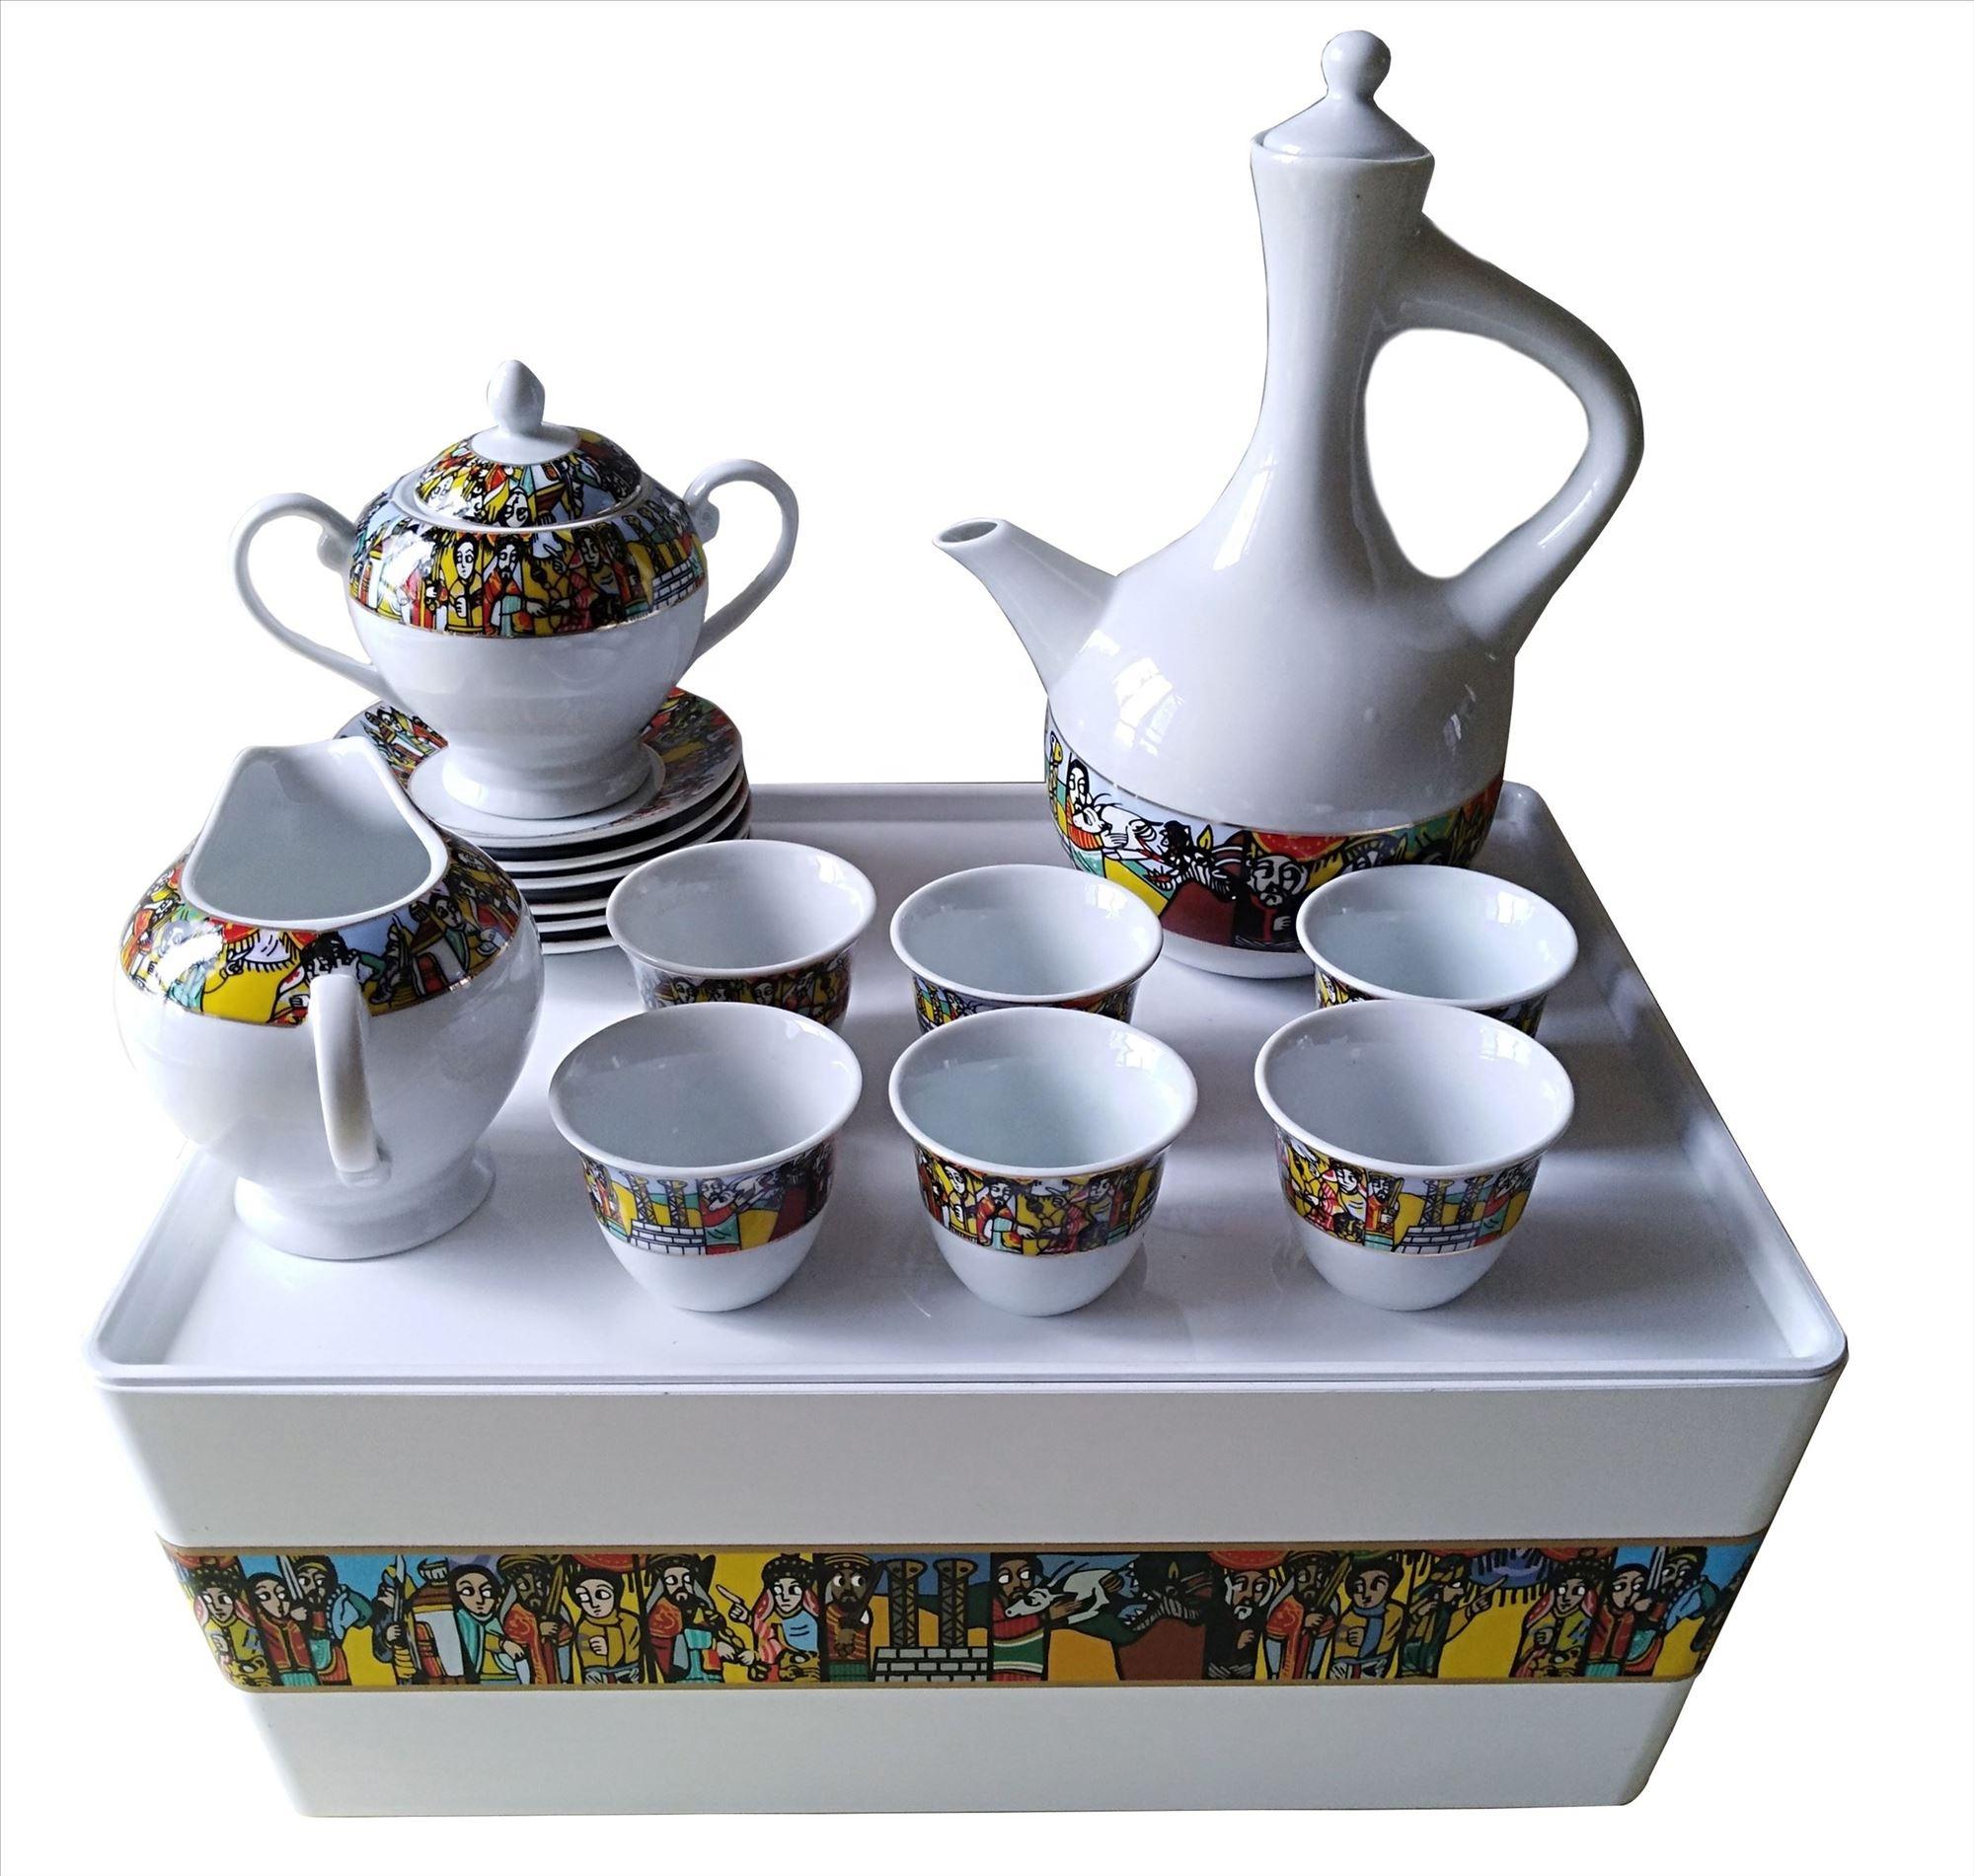 Alibaba.com / Ready to ship popular ethiopian coffee set with rekebot saba arts for ceremony